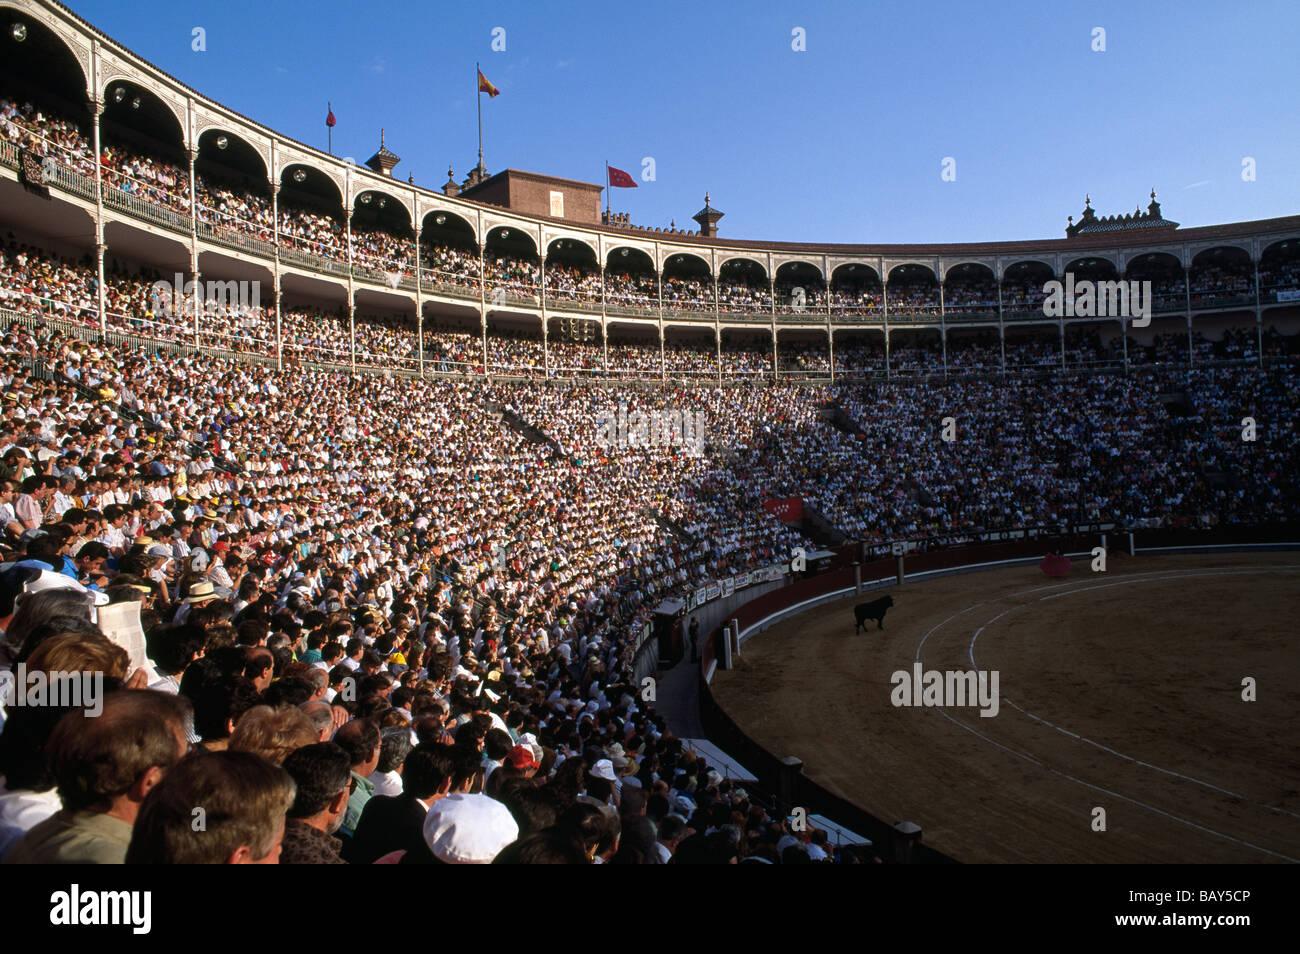 Fully occupied bullfighting arena, Fiesta de San Isidro, Madrid, Spain - Stock Image